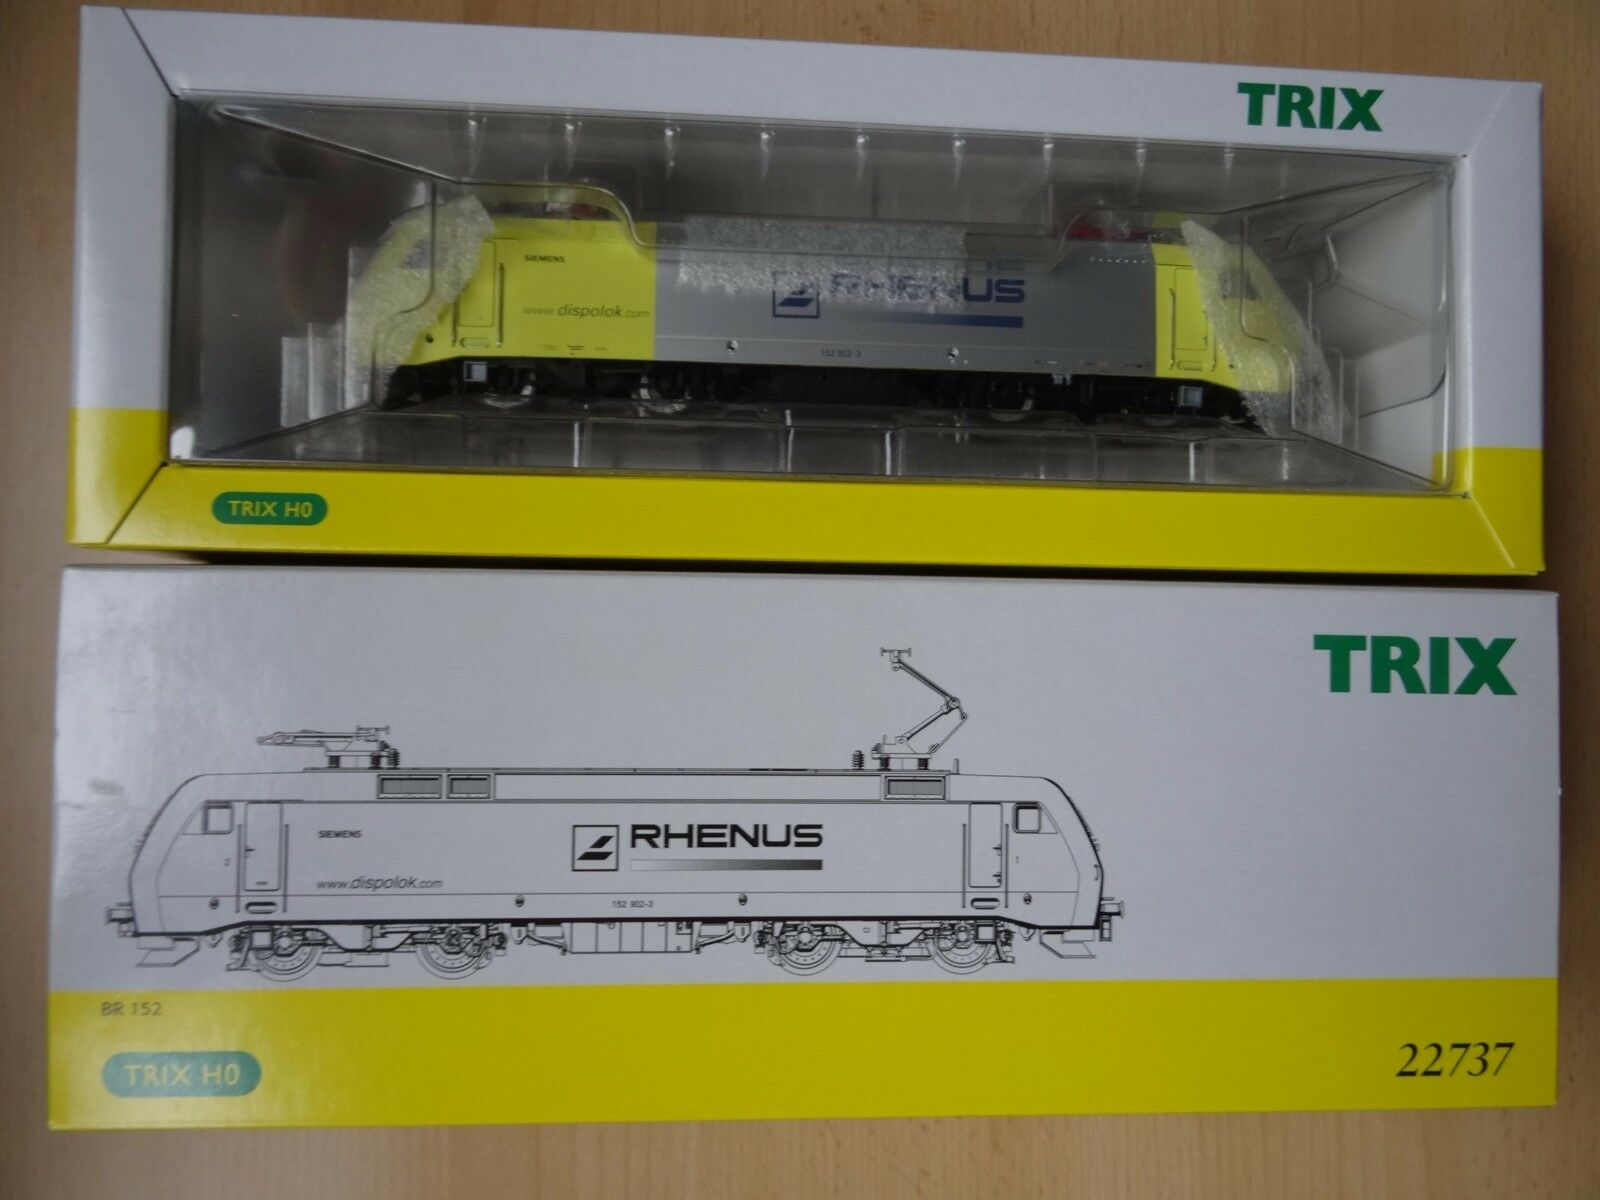 Trix  Artikel HO    22737  E-Lok BR 152  Rhenus   - Neuware aus Ladenauflösung    Economy  191e0d